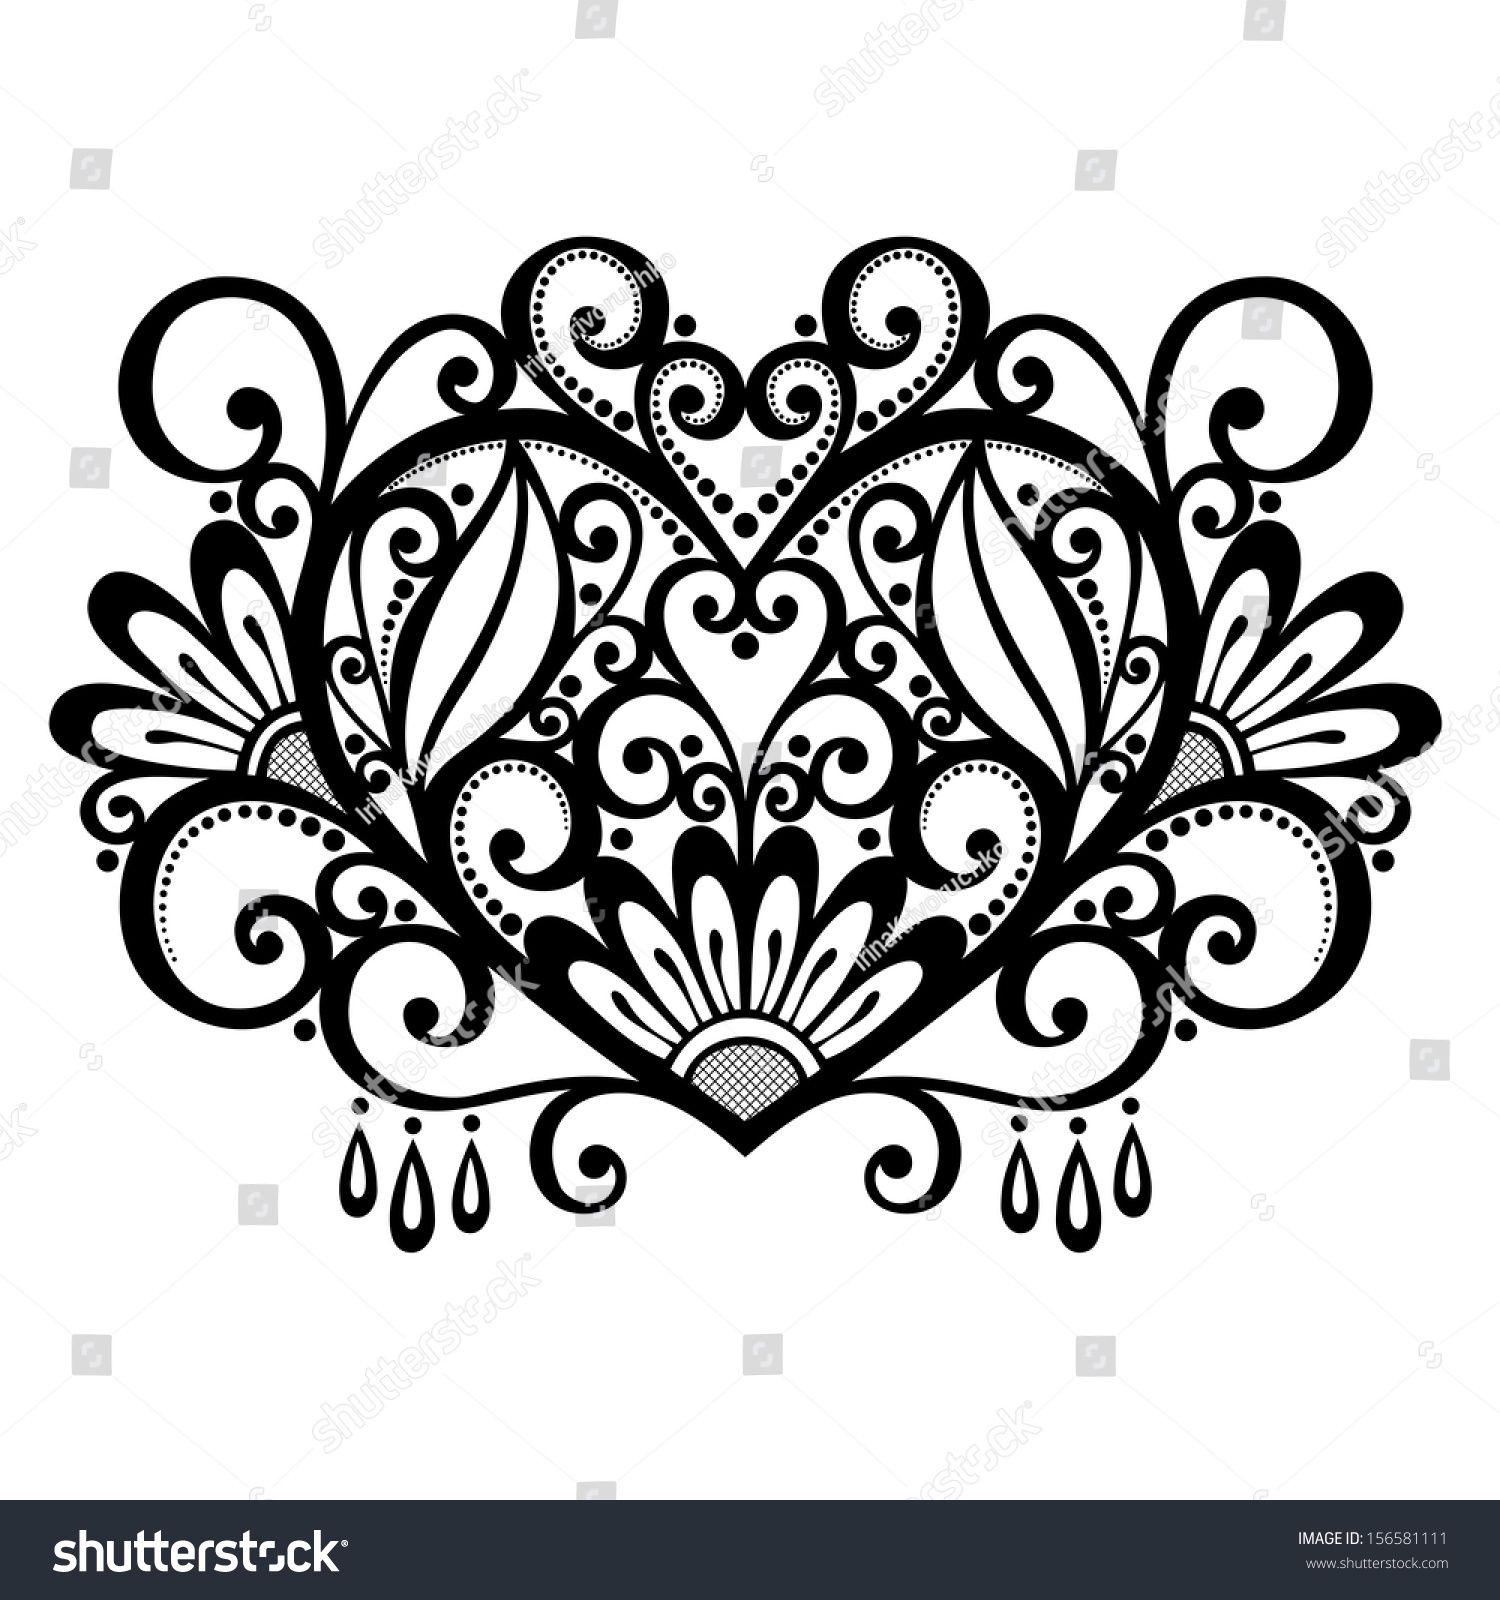 Vector deco floral heart design element stock vector for Element deco design